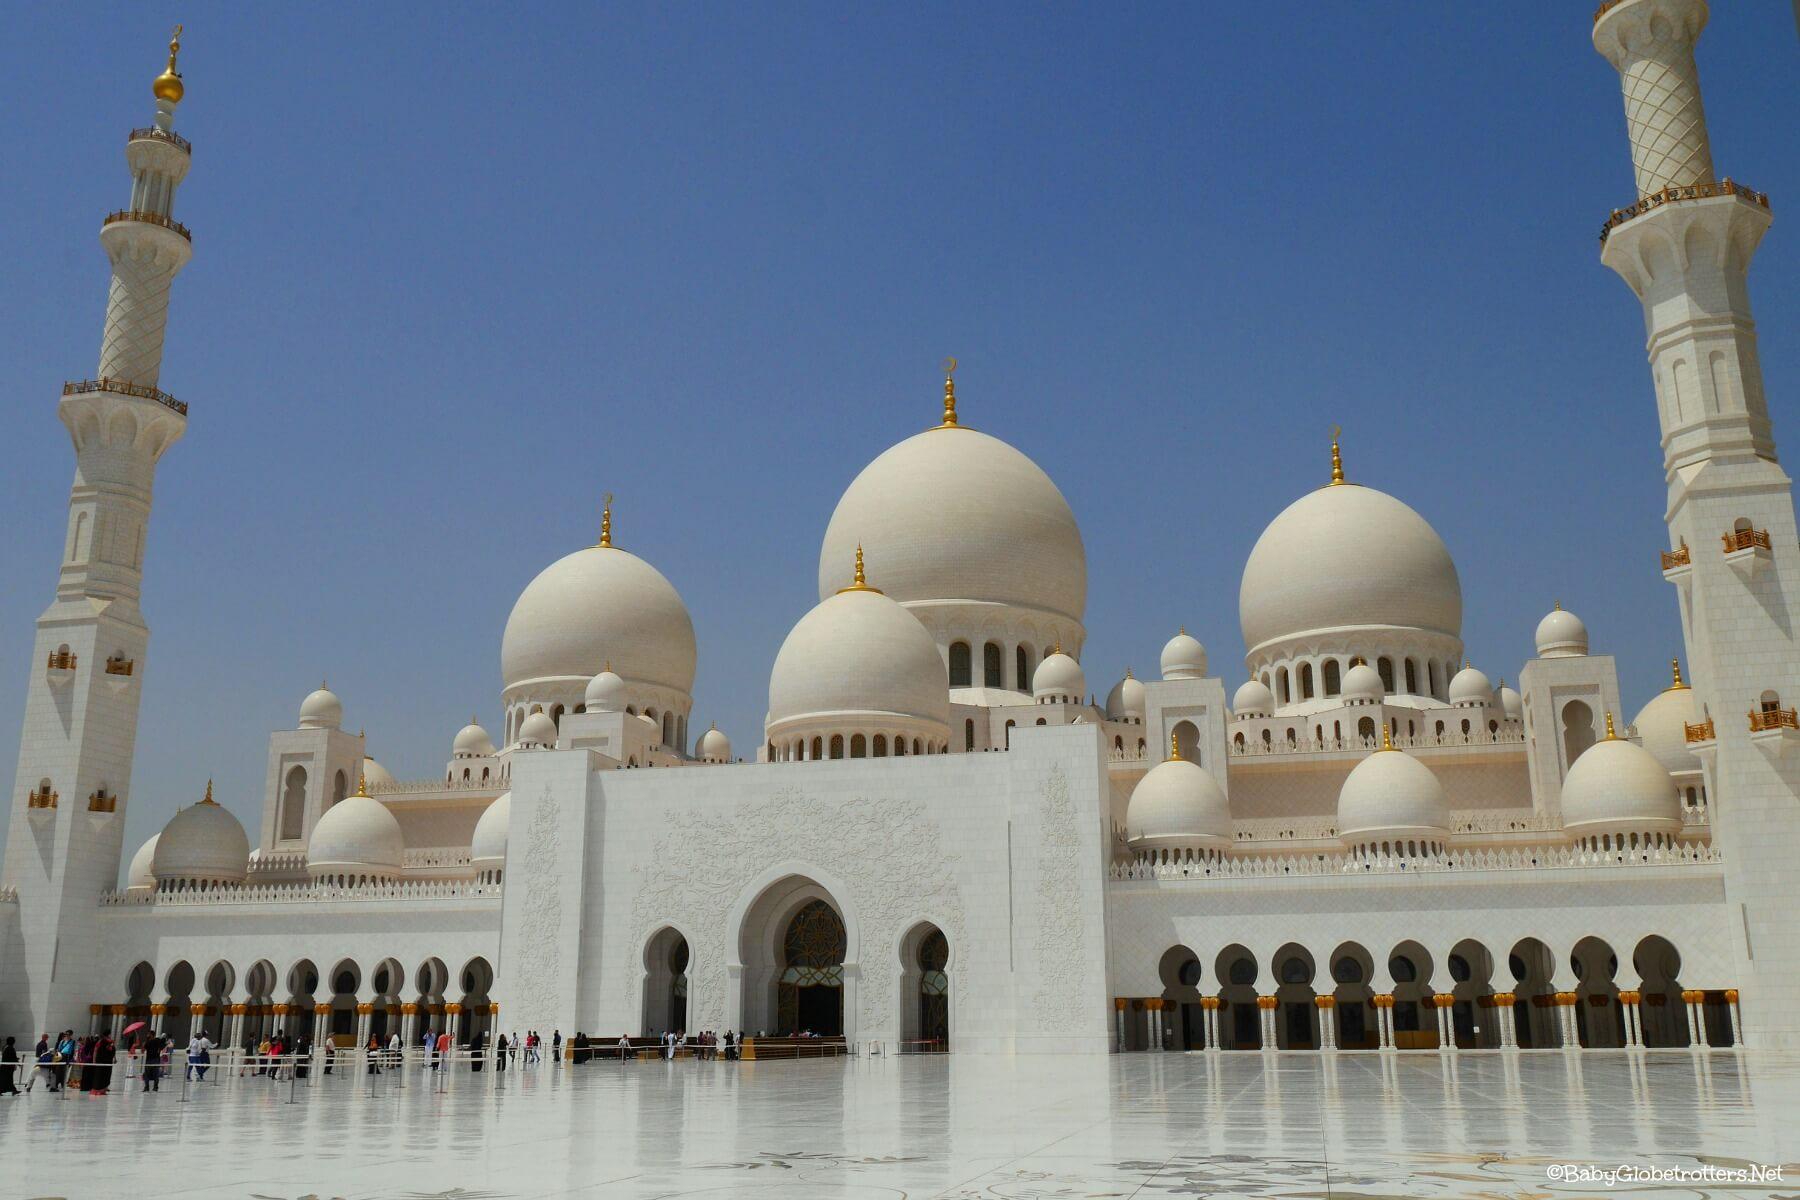 Fish aquarium in umm al quwain - Sheikh Zayed Grand Mosque Abu Dhabi Family Things To Do In Abu Dhabi